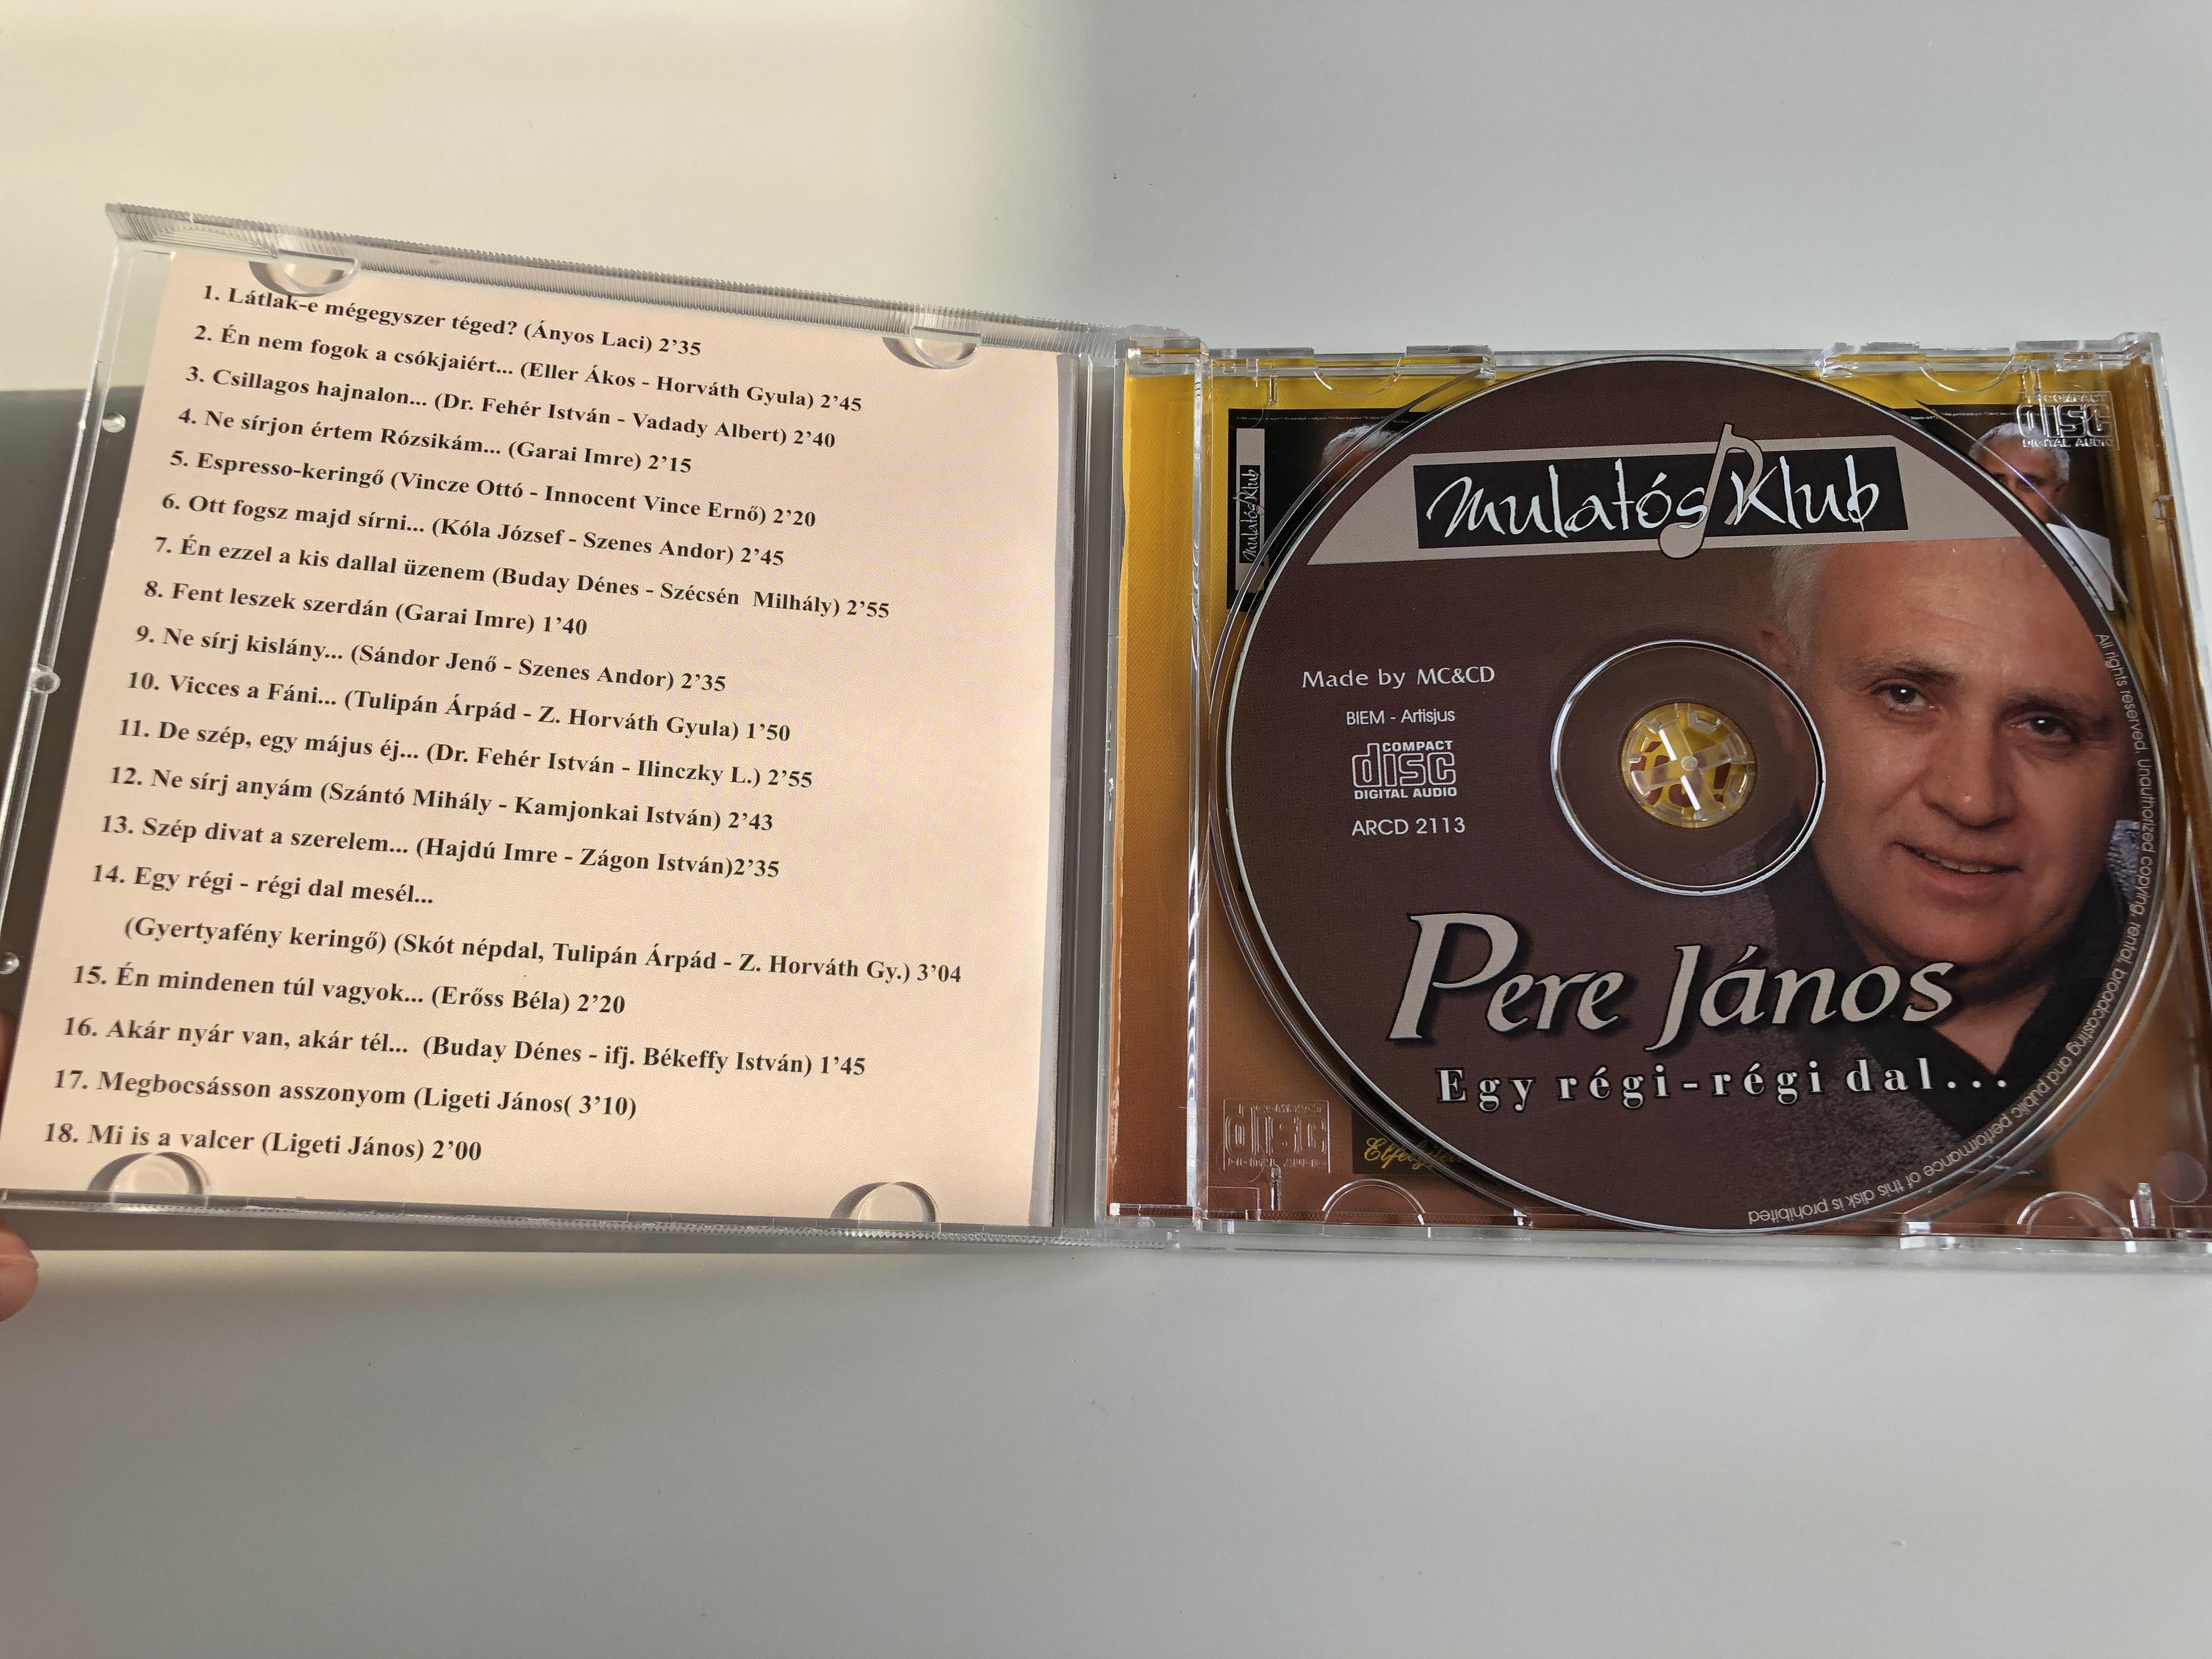 pere-ja-nos-egy-re-gi-re-gi-dal...img-2176.jpg